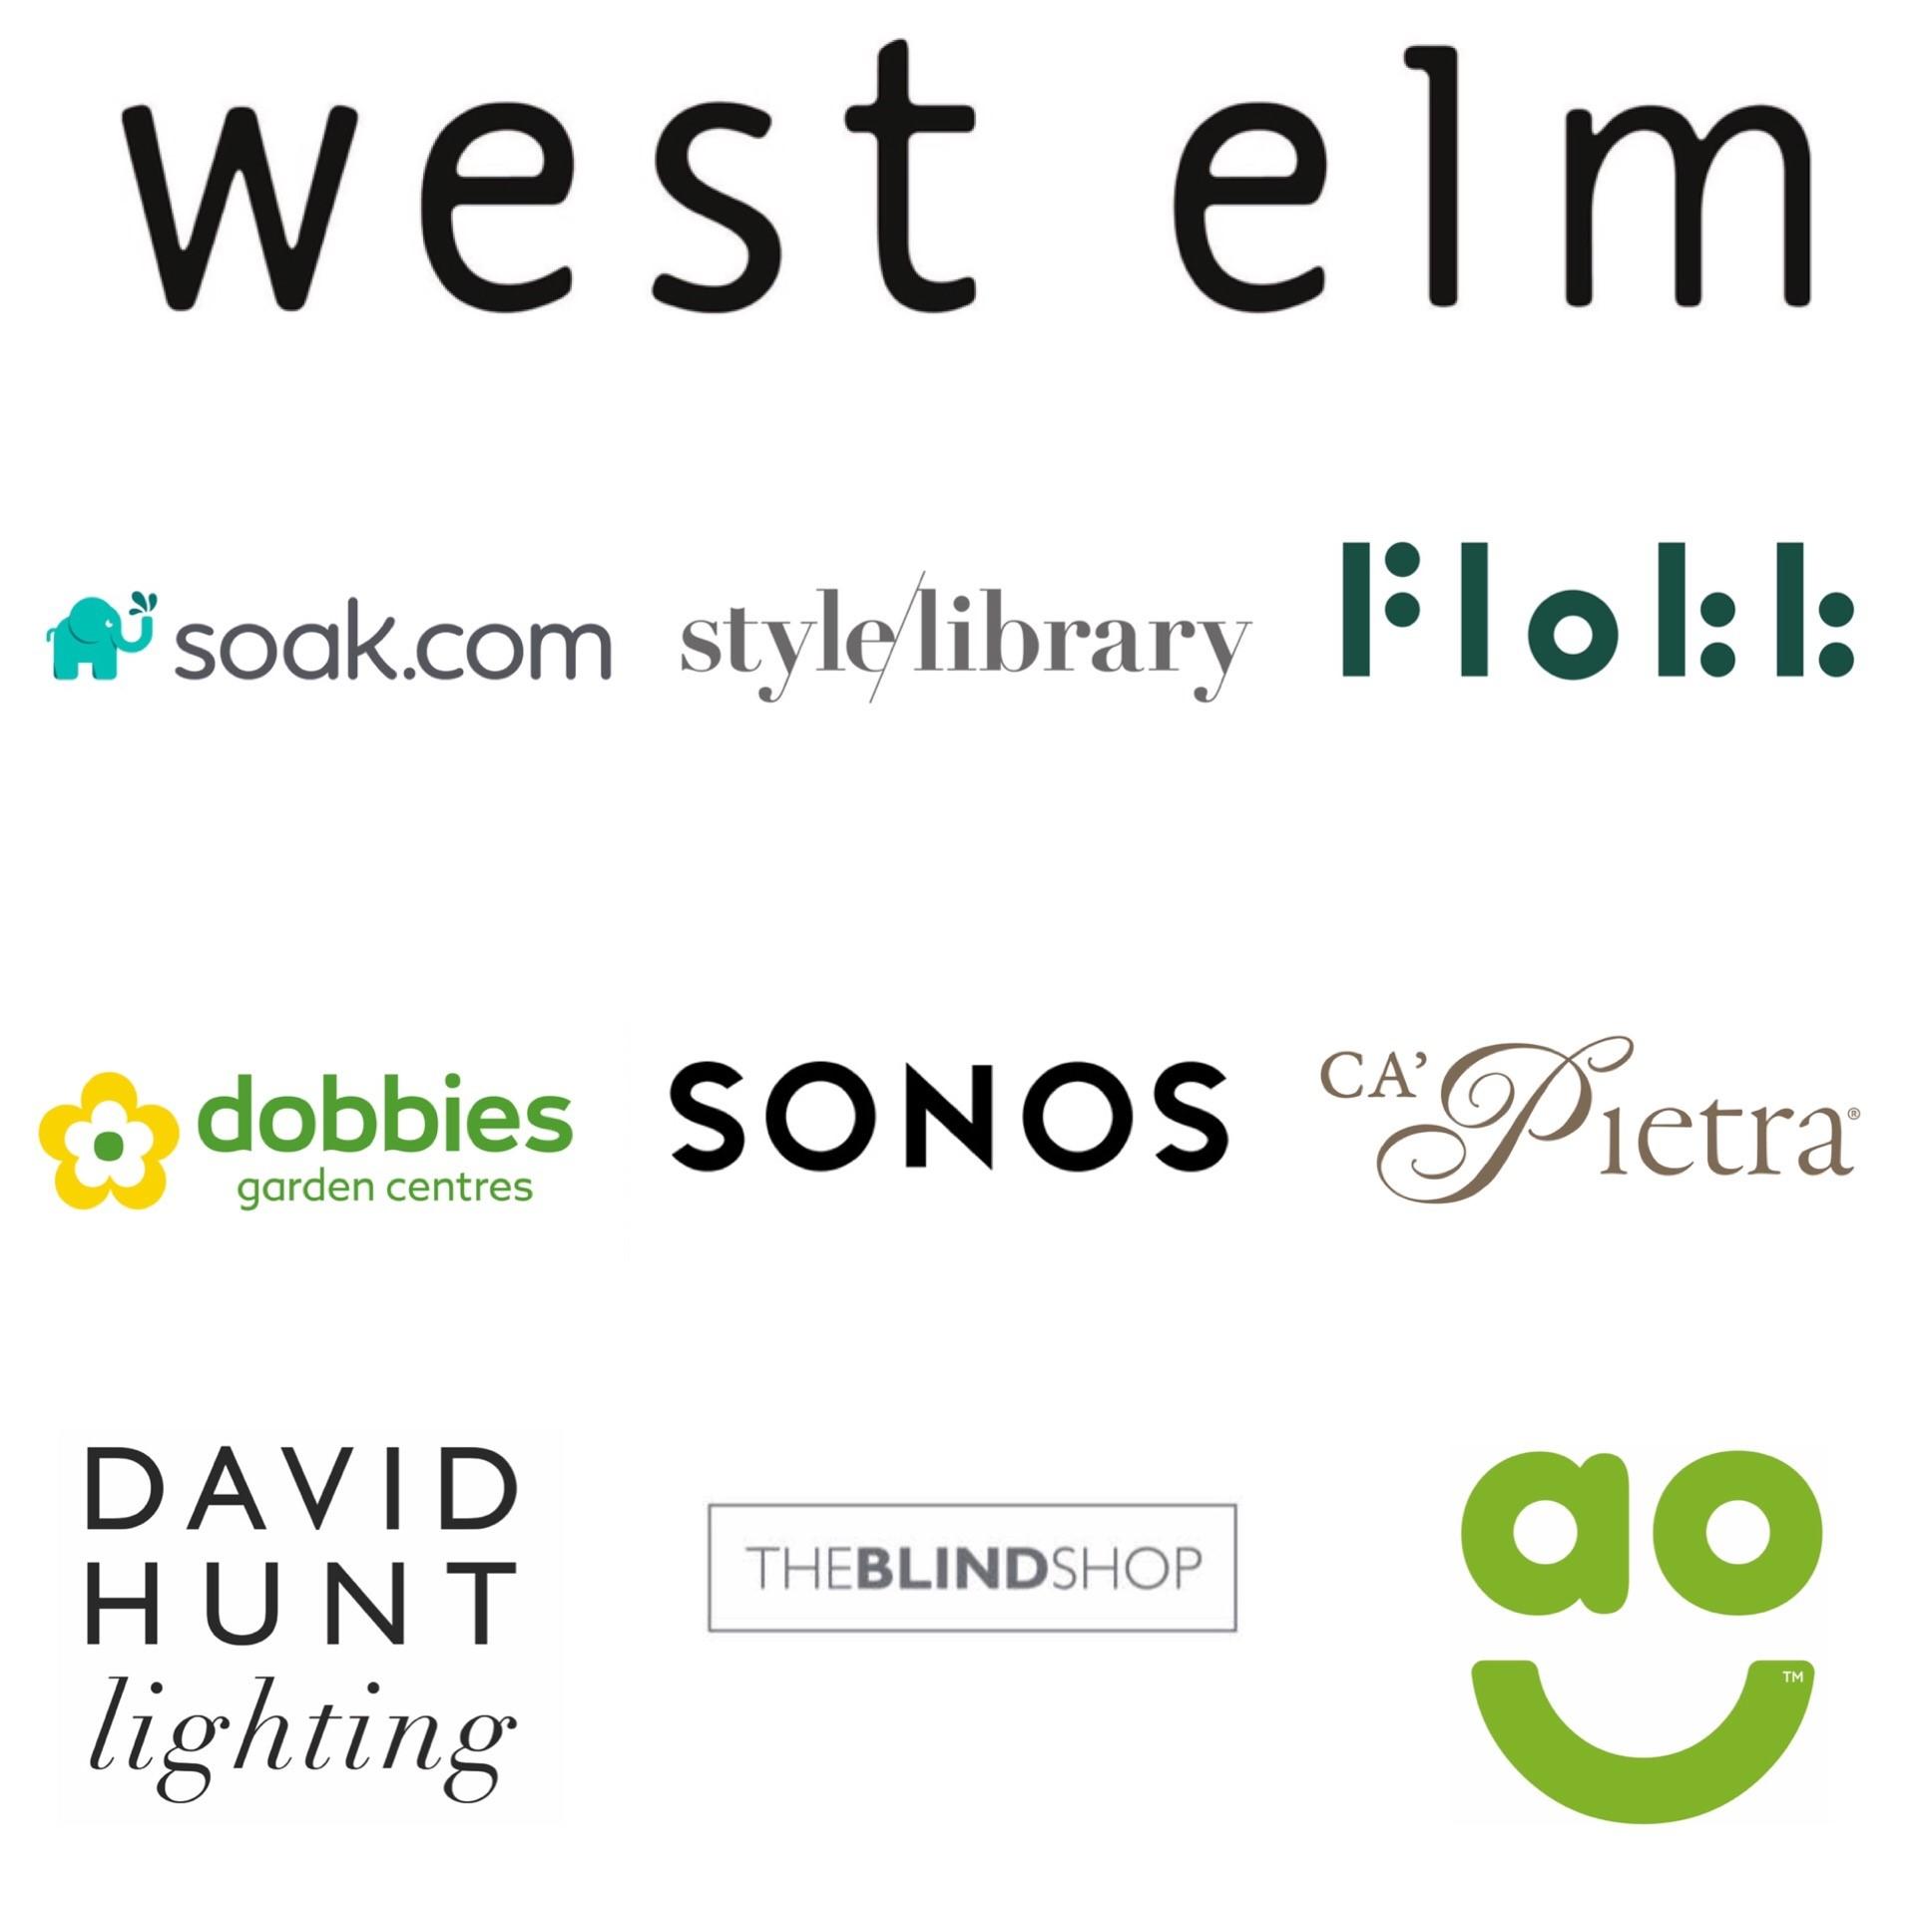 http://www.westelm.co.uk/    https://soak.com    https://www.stylelibrary.com/    https://www.dobbies.com/    https://www.sonos.com/en-gb/home    https://capietra.com/    https://www.davidhuntlighting.co.uk/    https://ao.com/    https://www.theblindshop.com/    https://www.flokk.com/rbm/products